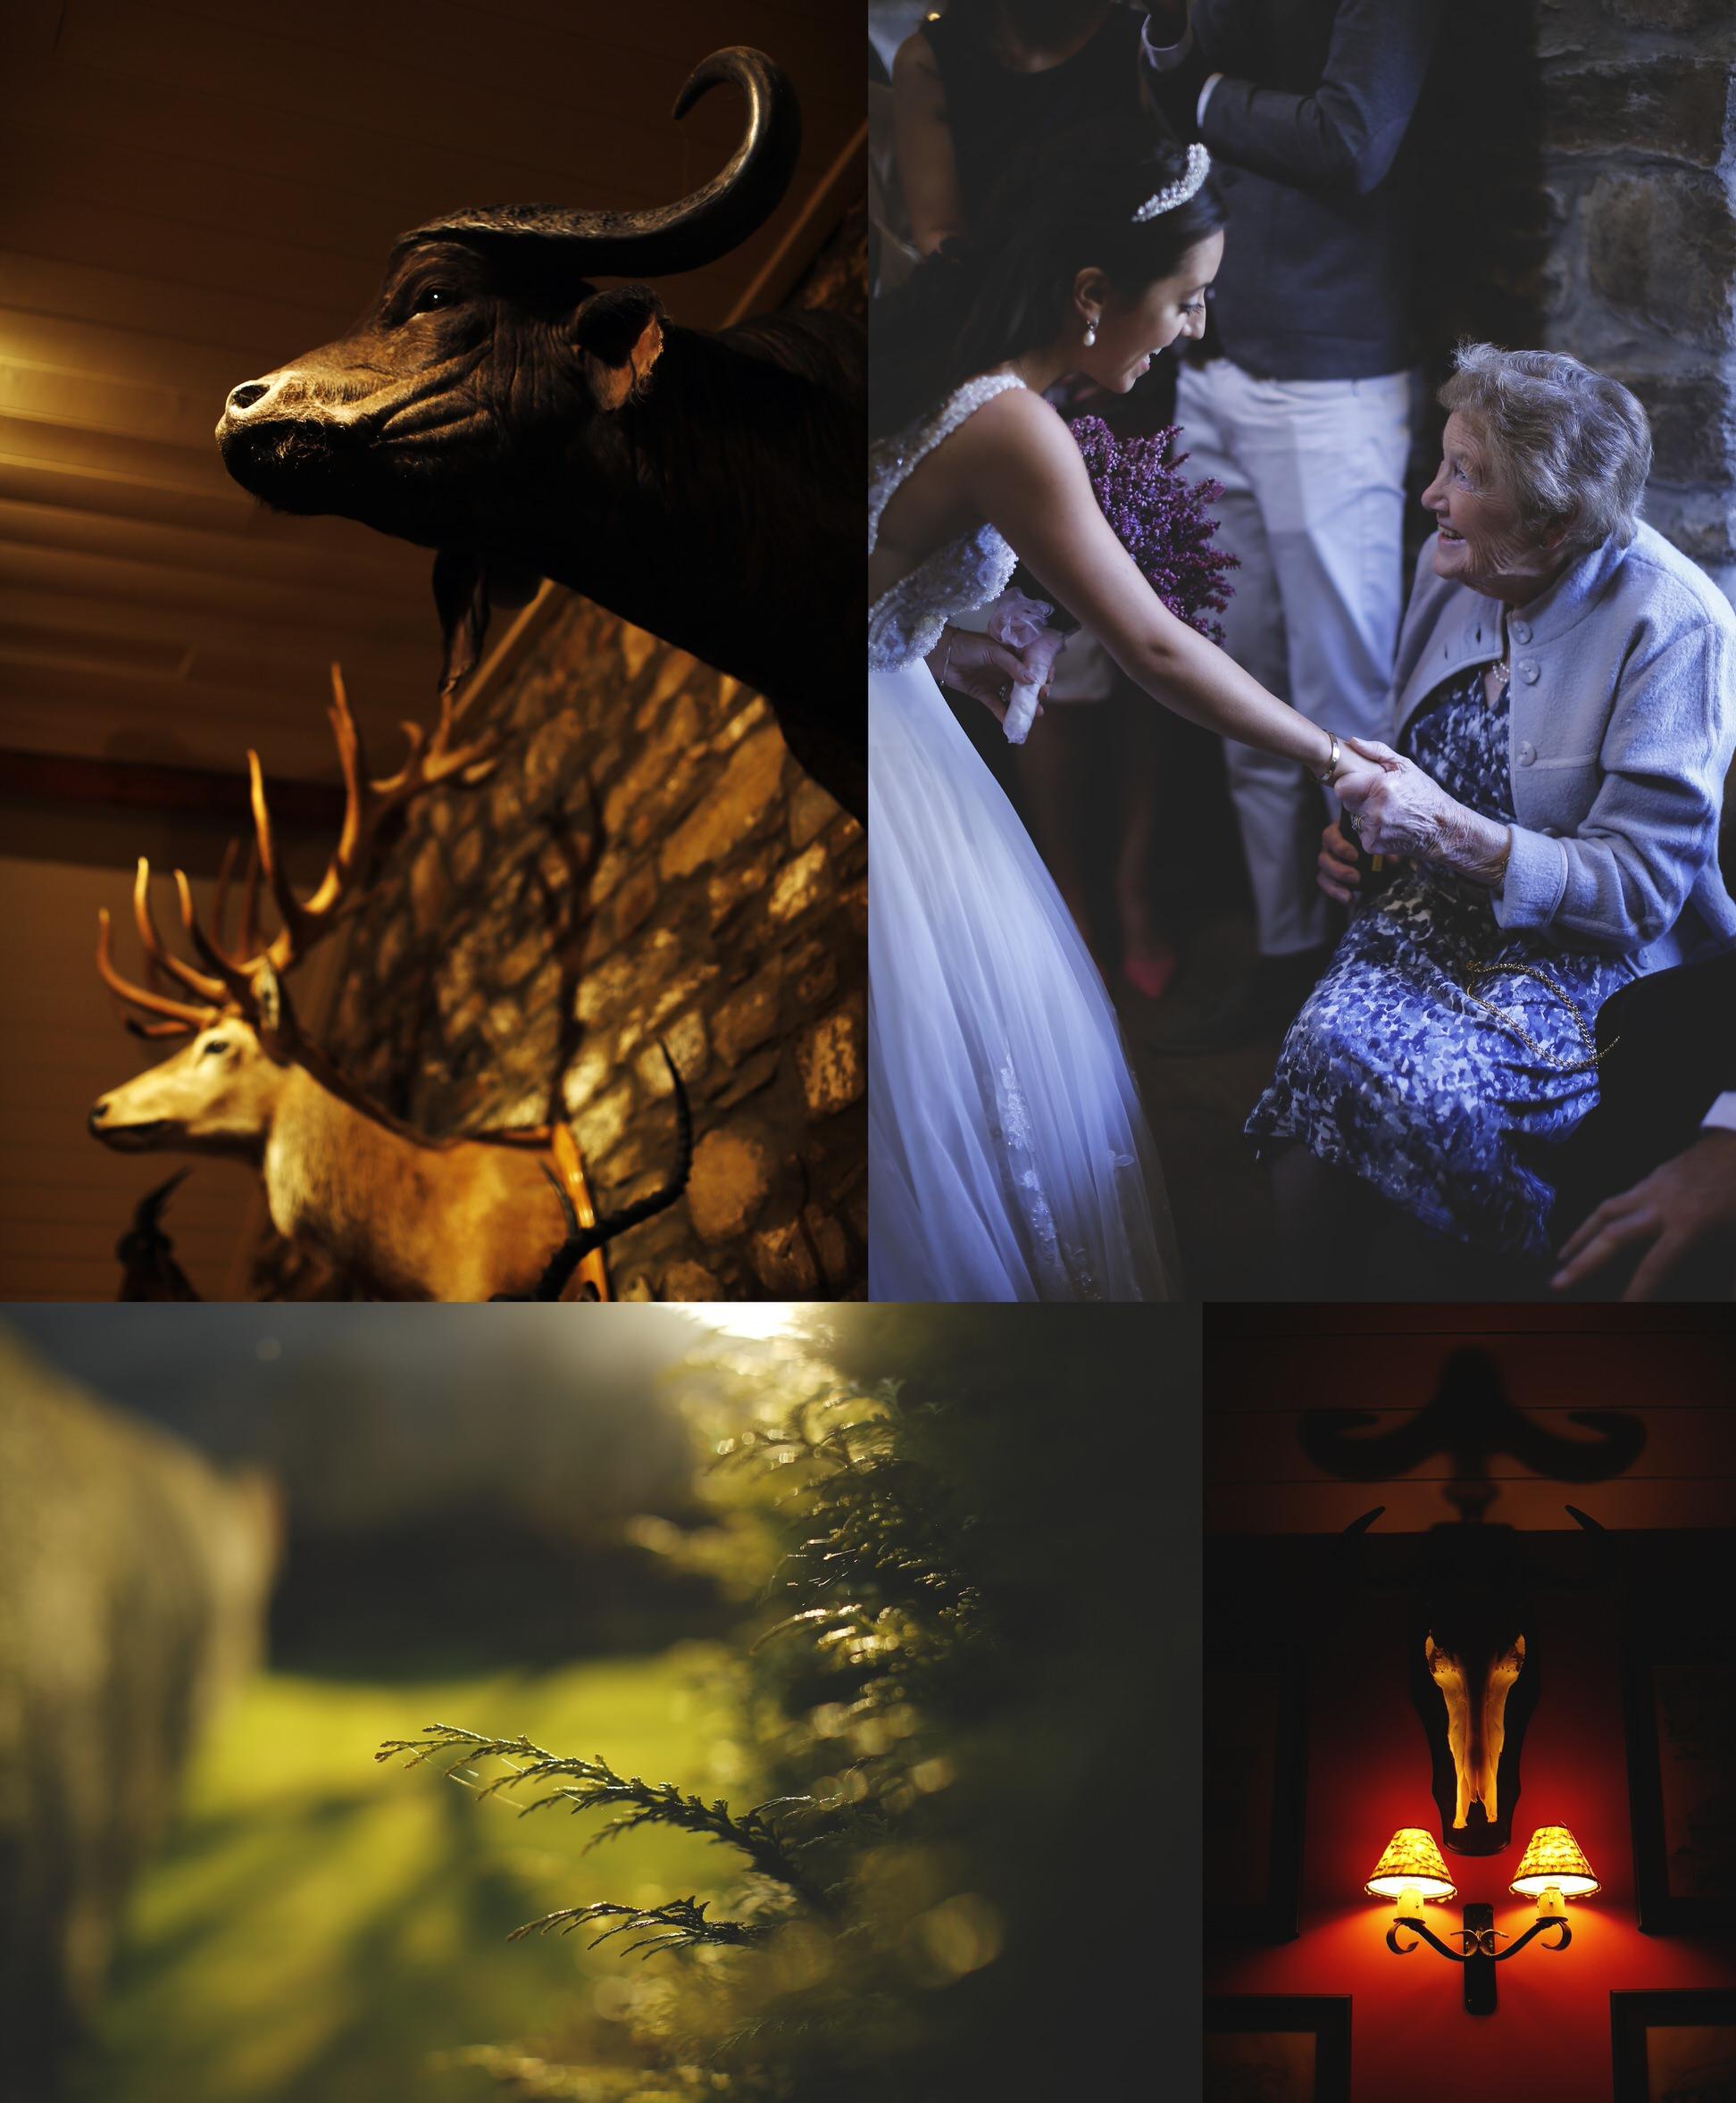 brett-harkness-cotland-wedding-photographer-highland-wedding_0030.jpg